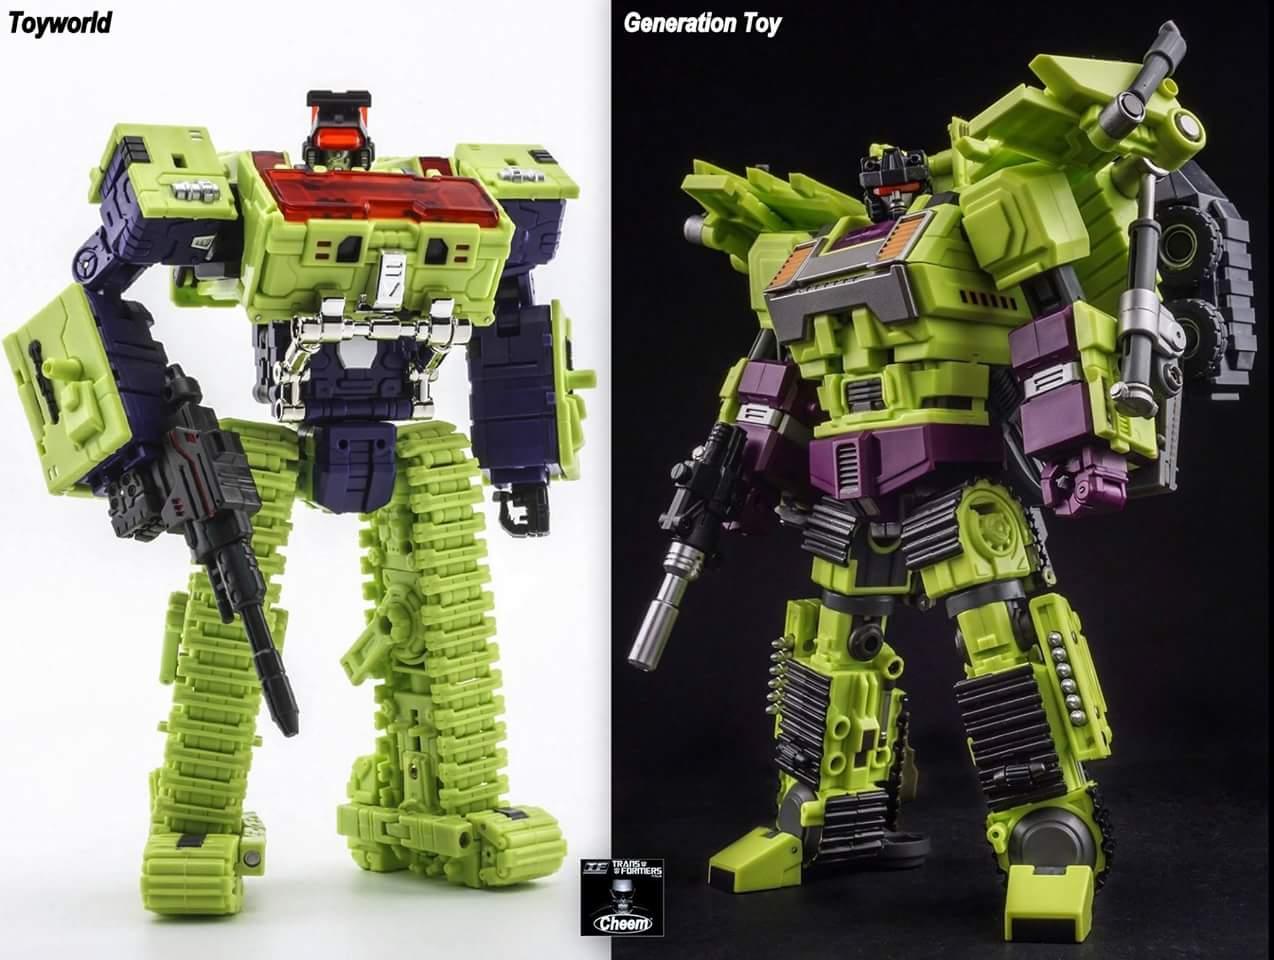 [Generation Toy] Produit Tiers - Jouet GT-01 Gravity Builder - aka Devastator/Dévastateur - Page 3 OTIsLlx9